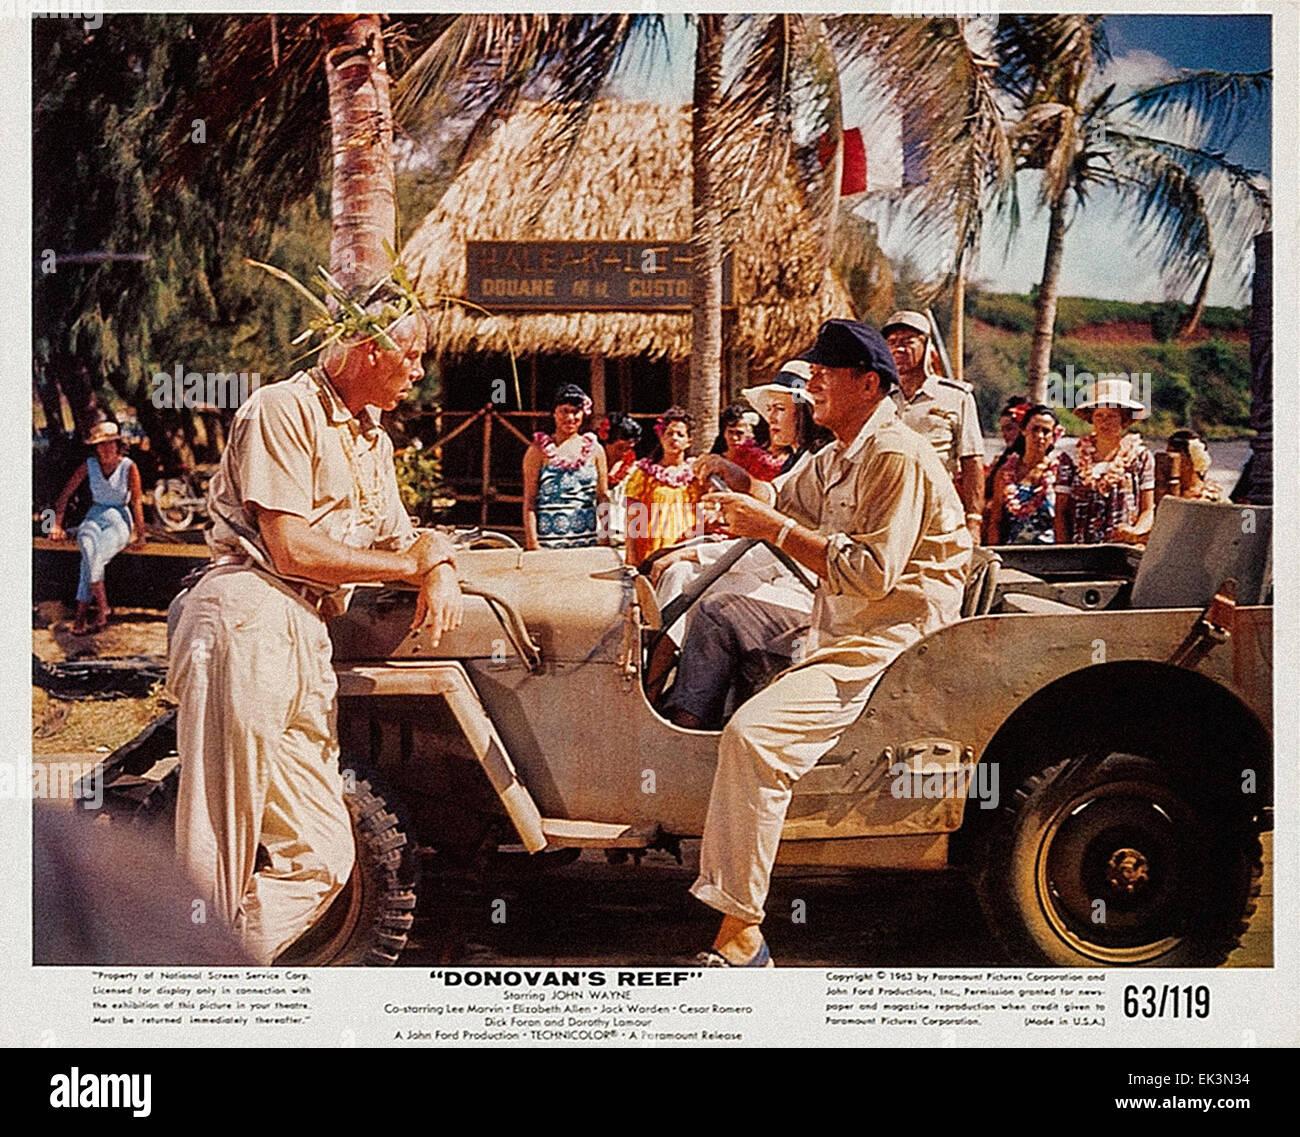 Donovan's Reef  - John Wayne - Movie Poster - Stock Image